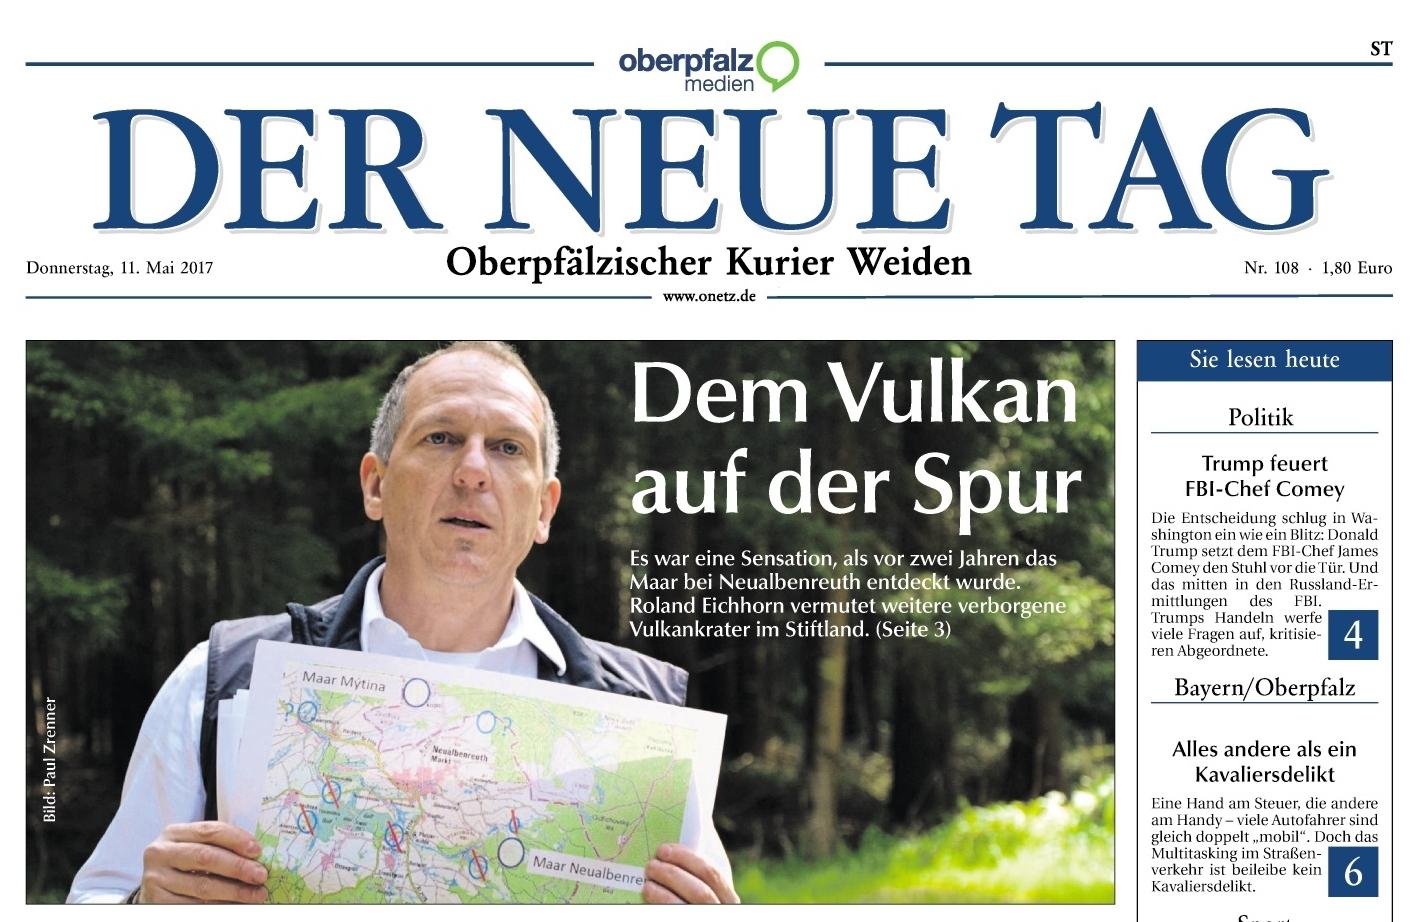 2017-05-11 Neualbenreuther Maar Titelseite